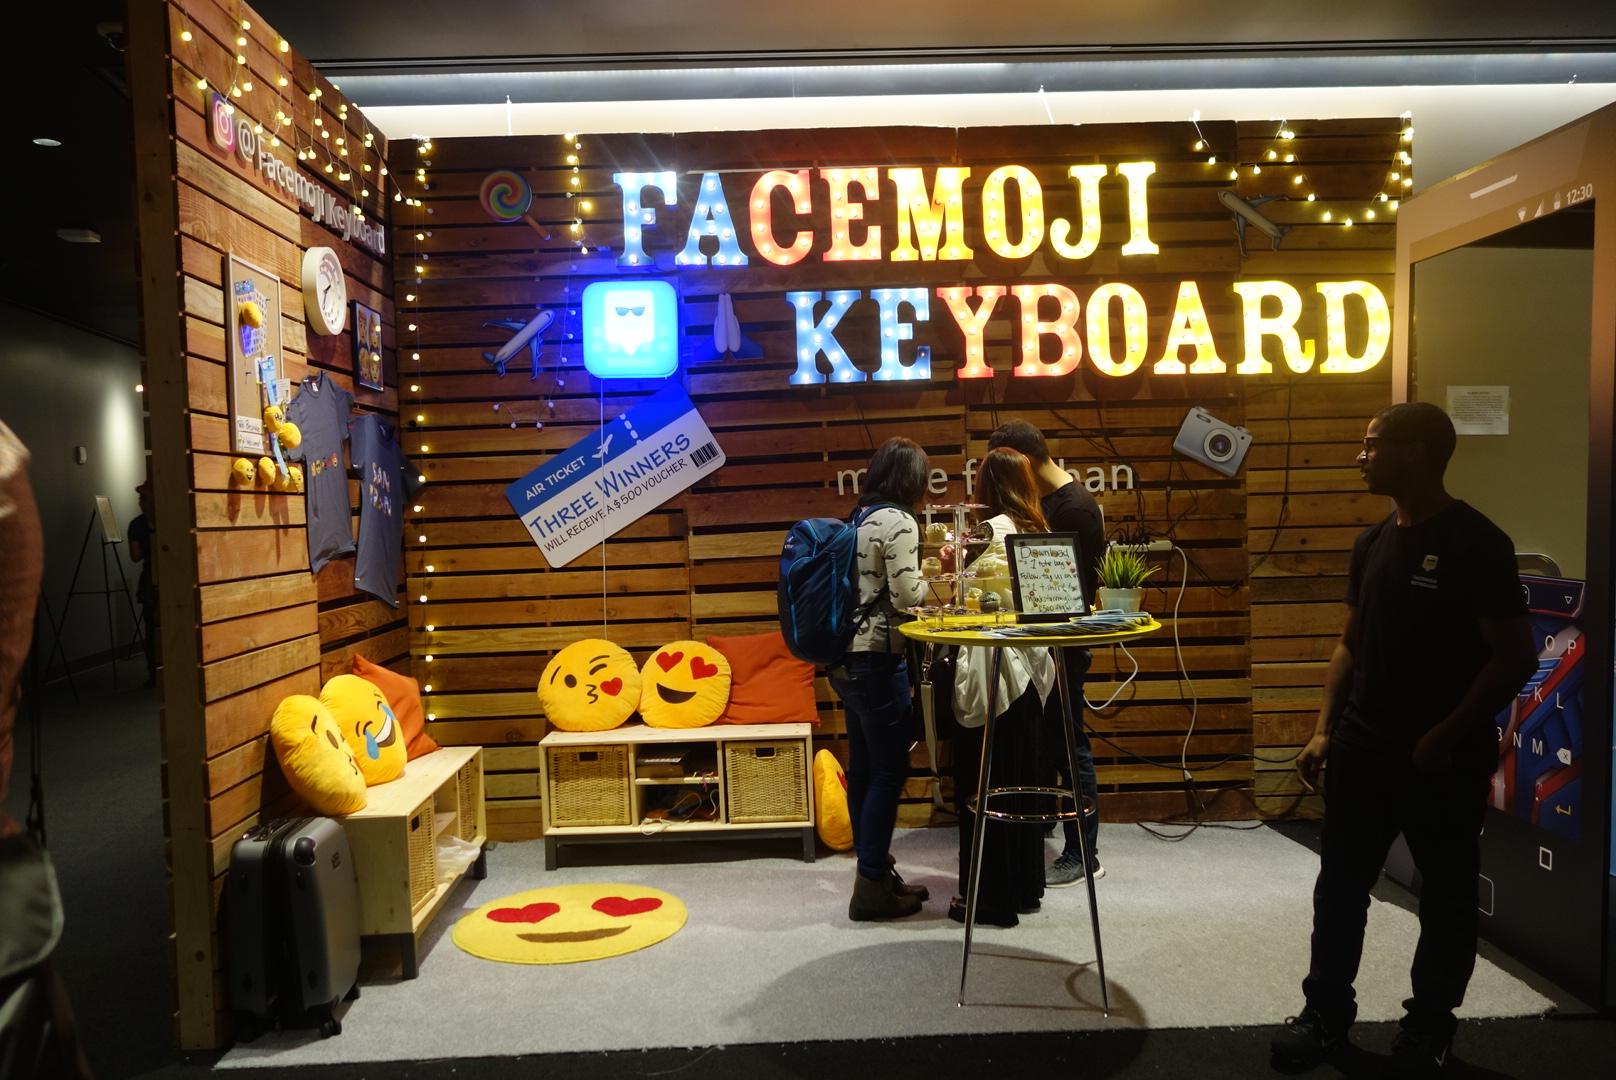 The first emoji convention, Emojicon, was held in San Francisco on Nov. 4 through 6, 2016.